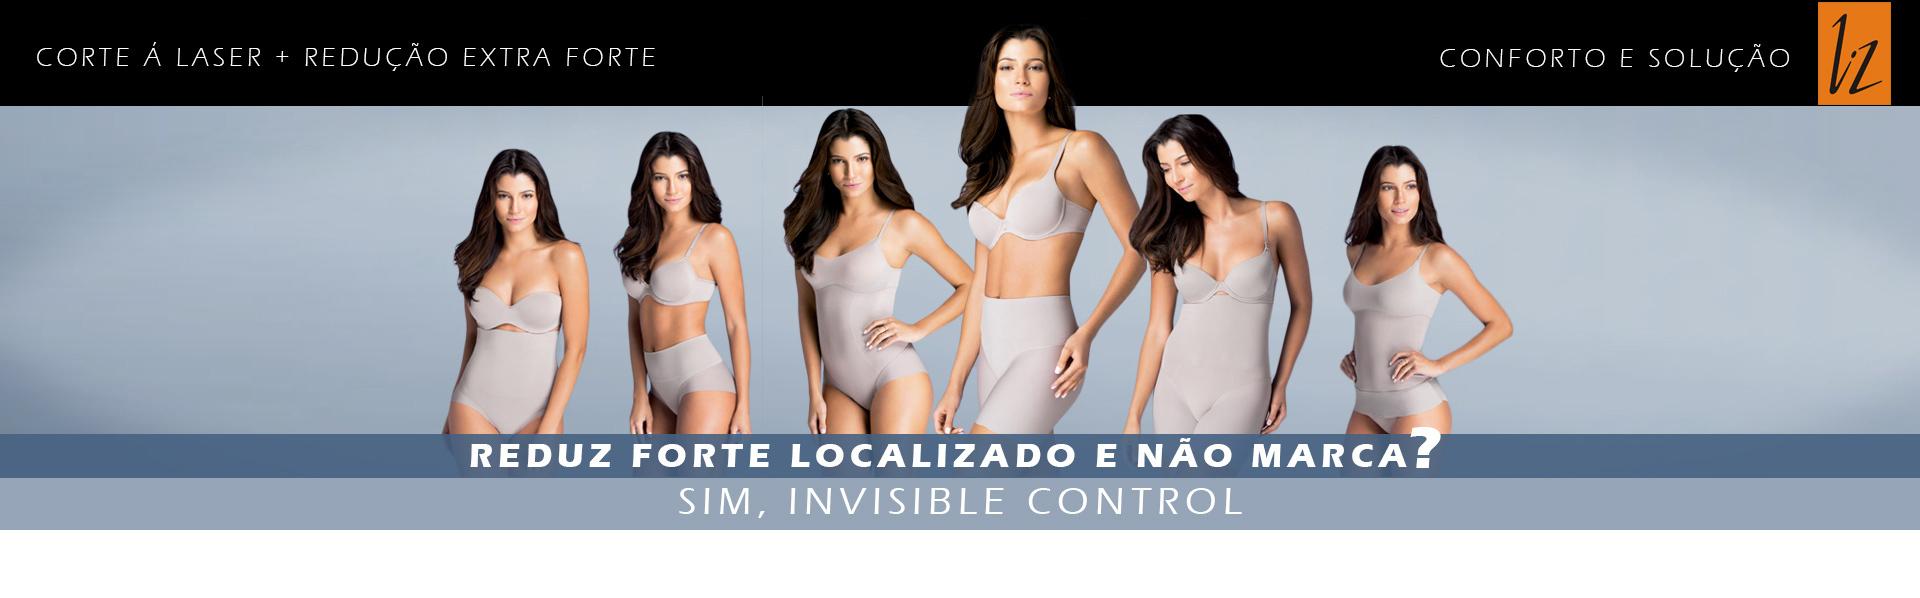 Invisible Control - Zero marcas e reduz medidas extra forte